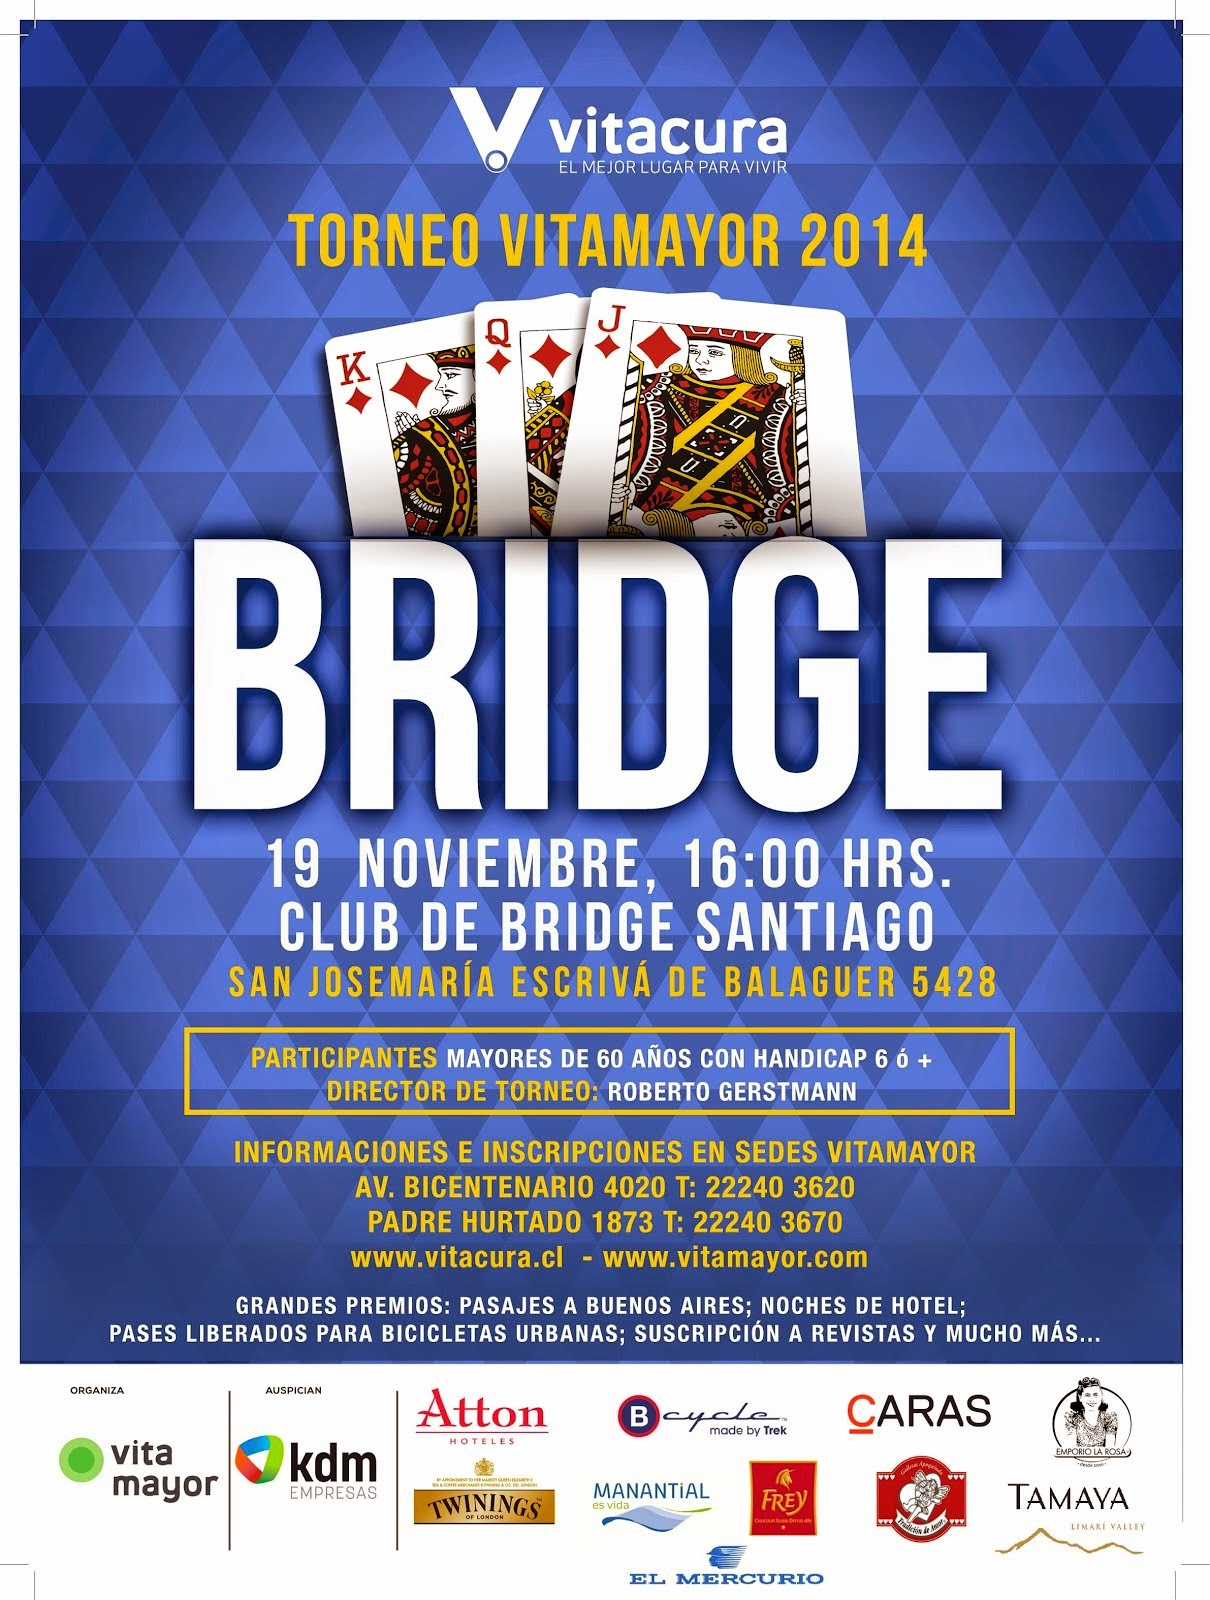 GRAN CAMPEONATO DE BRIDGE